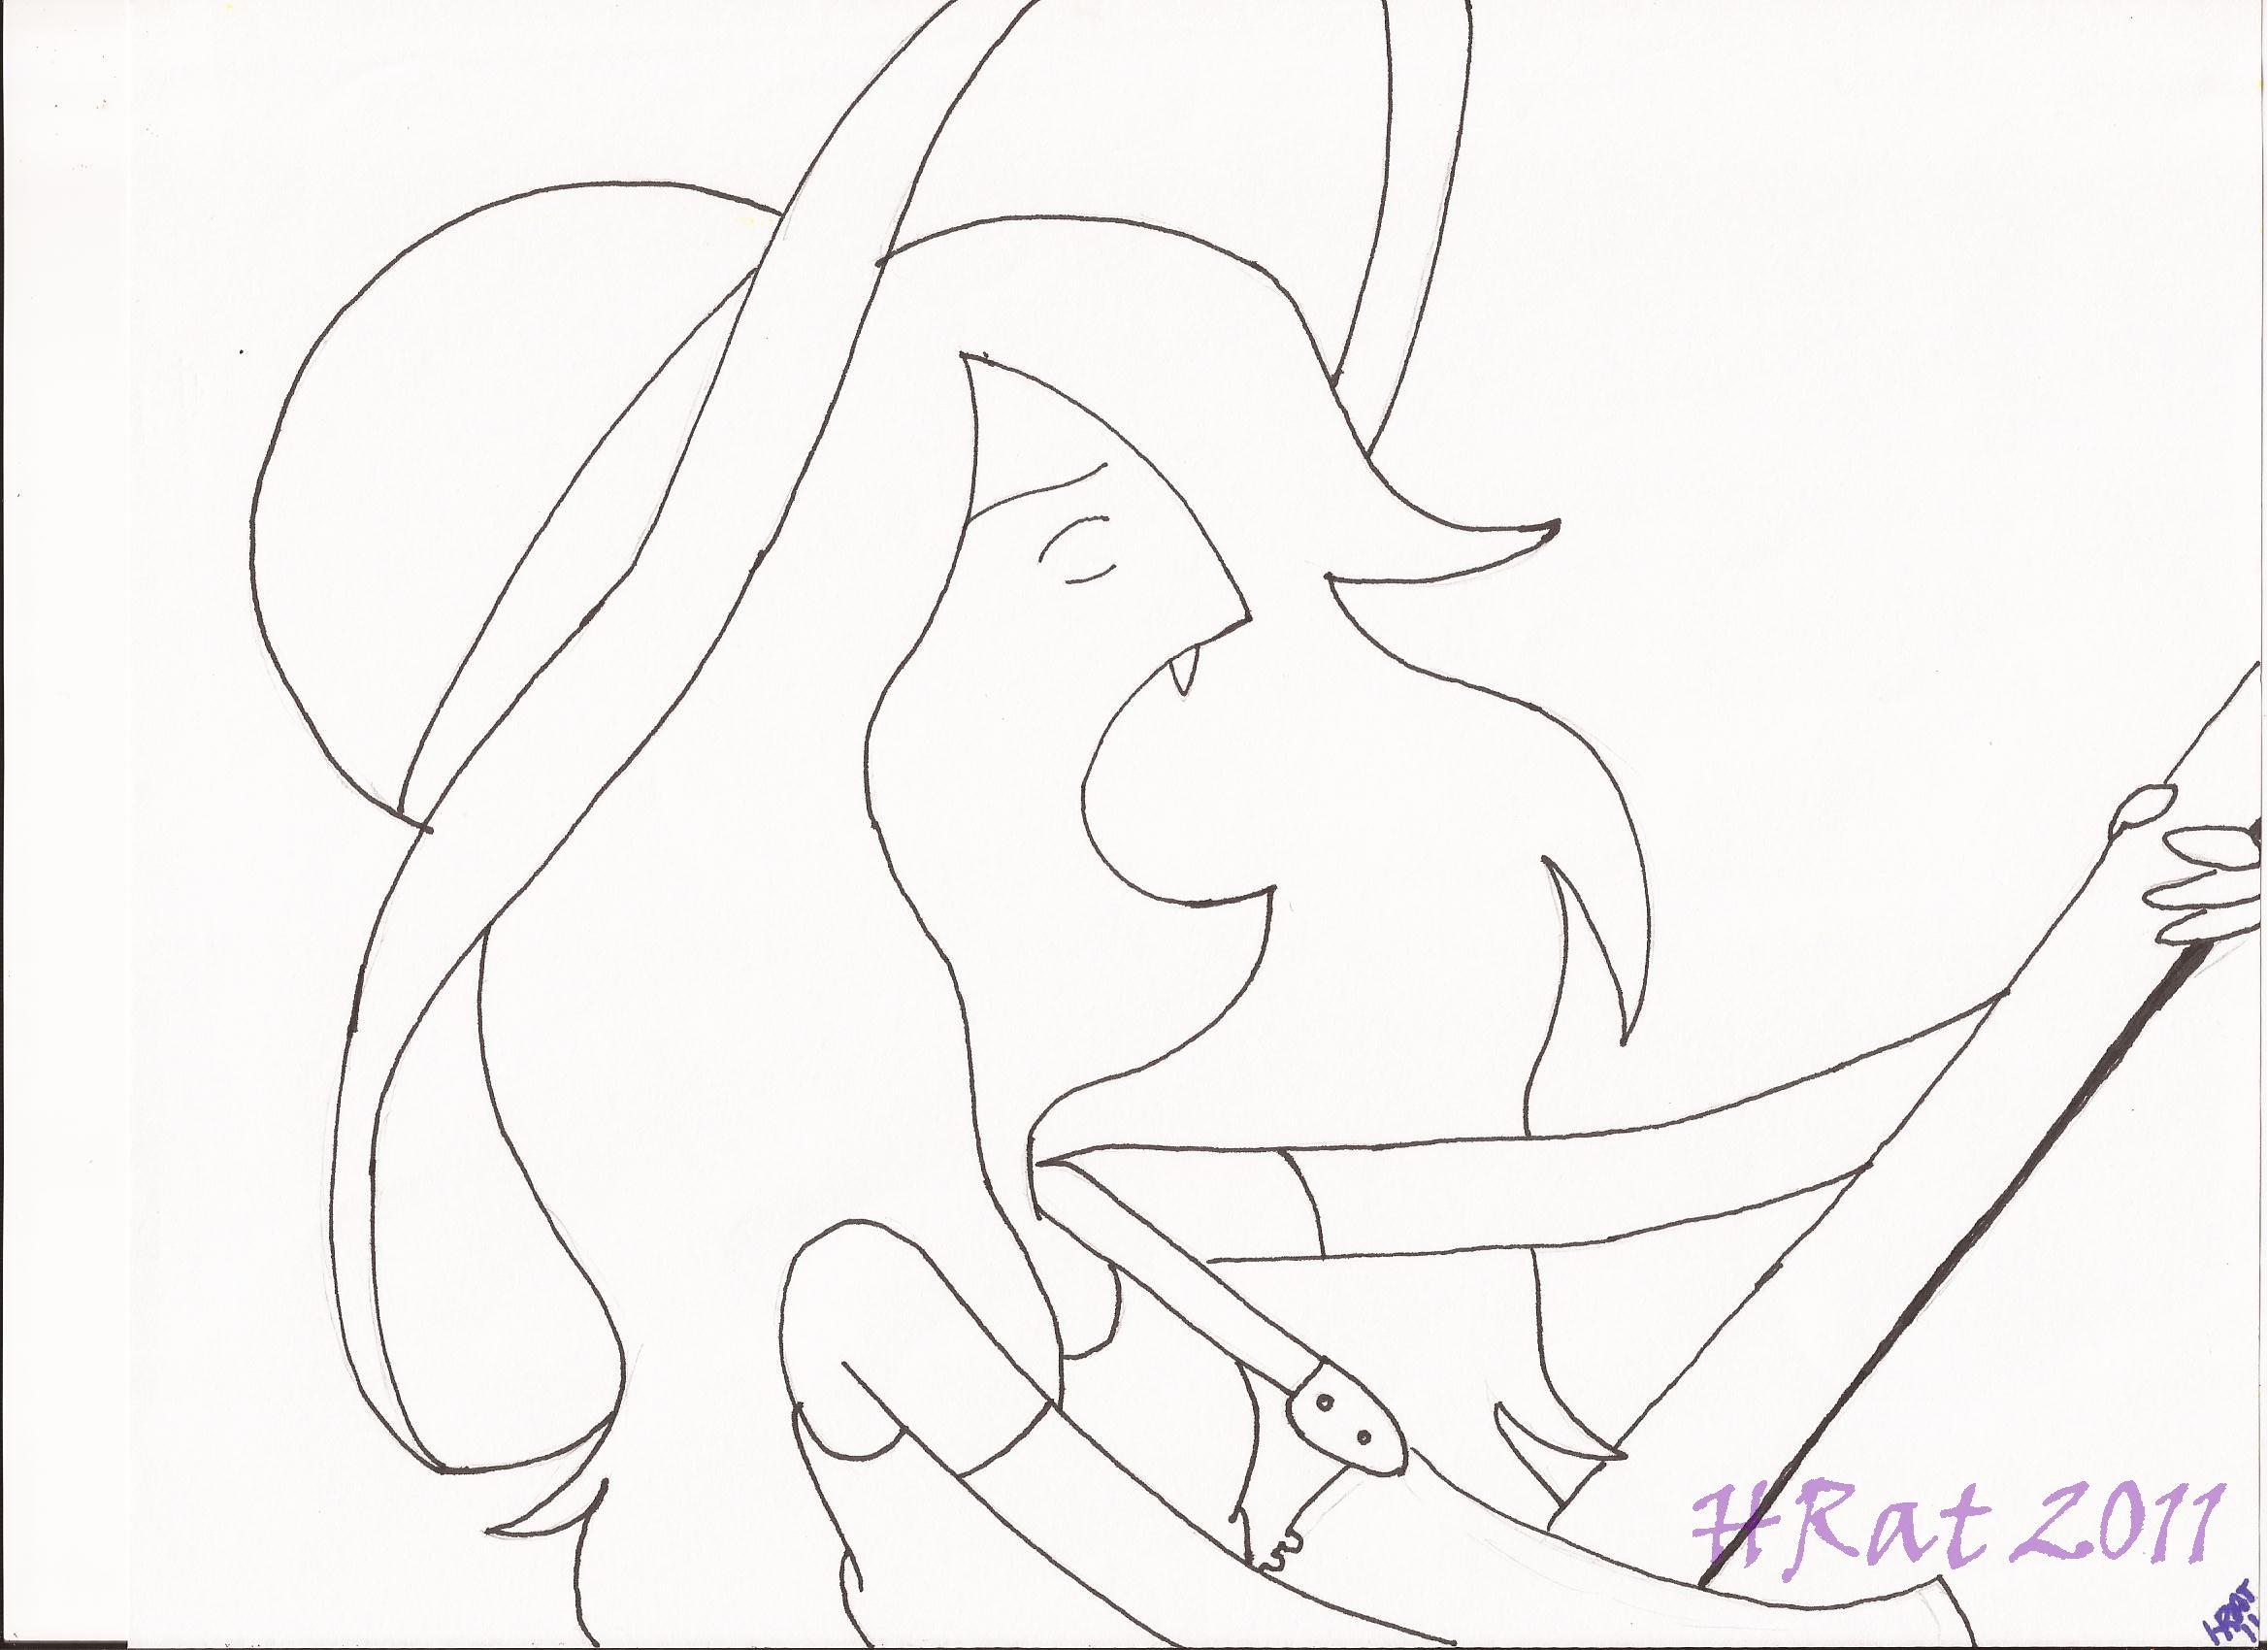 Marceline from Adventure Time by HNRat on DeviantArt